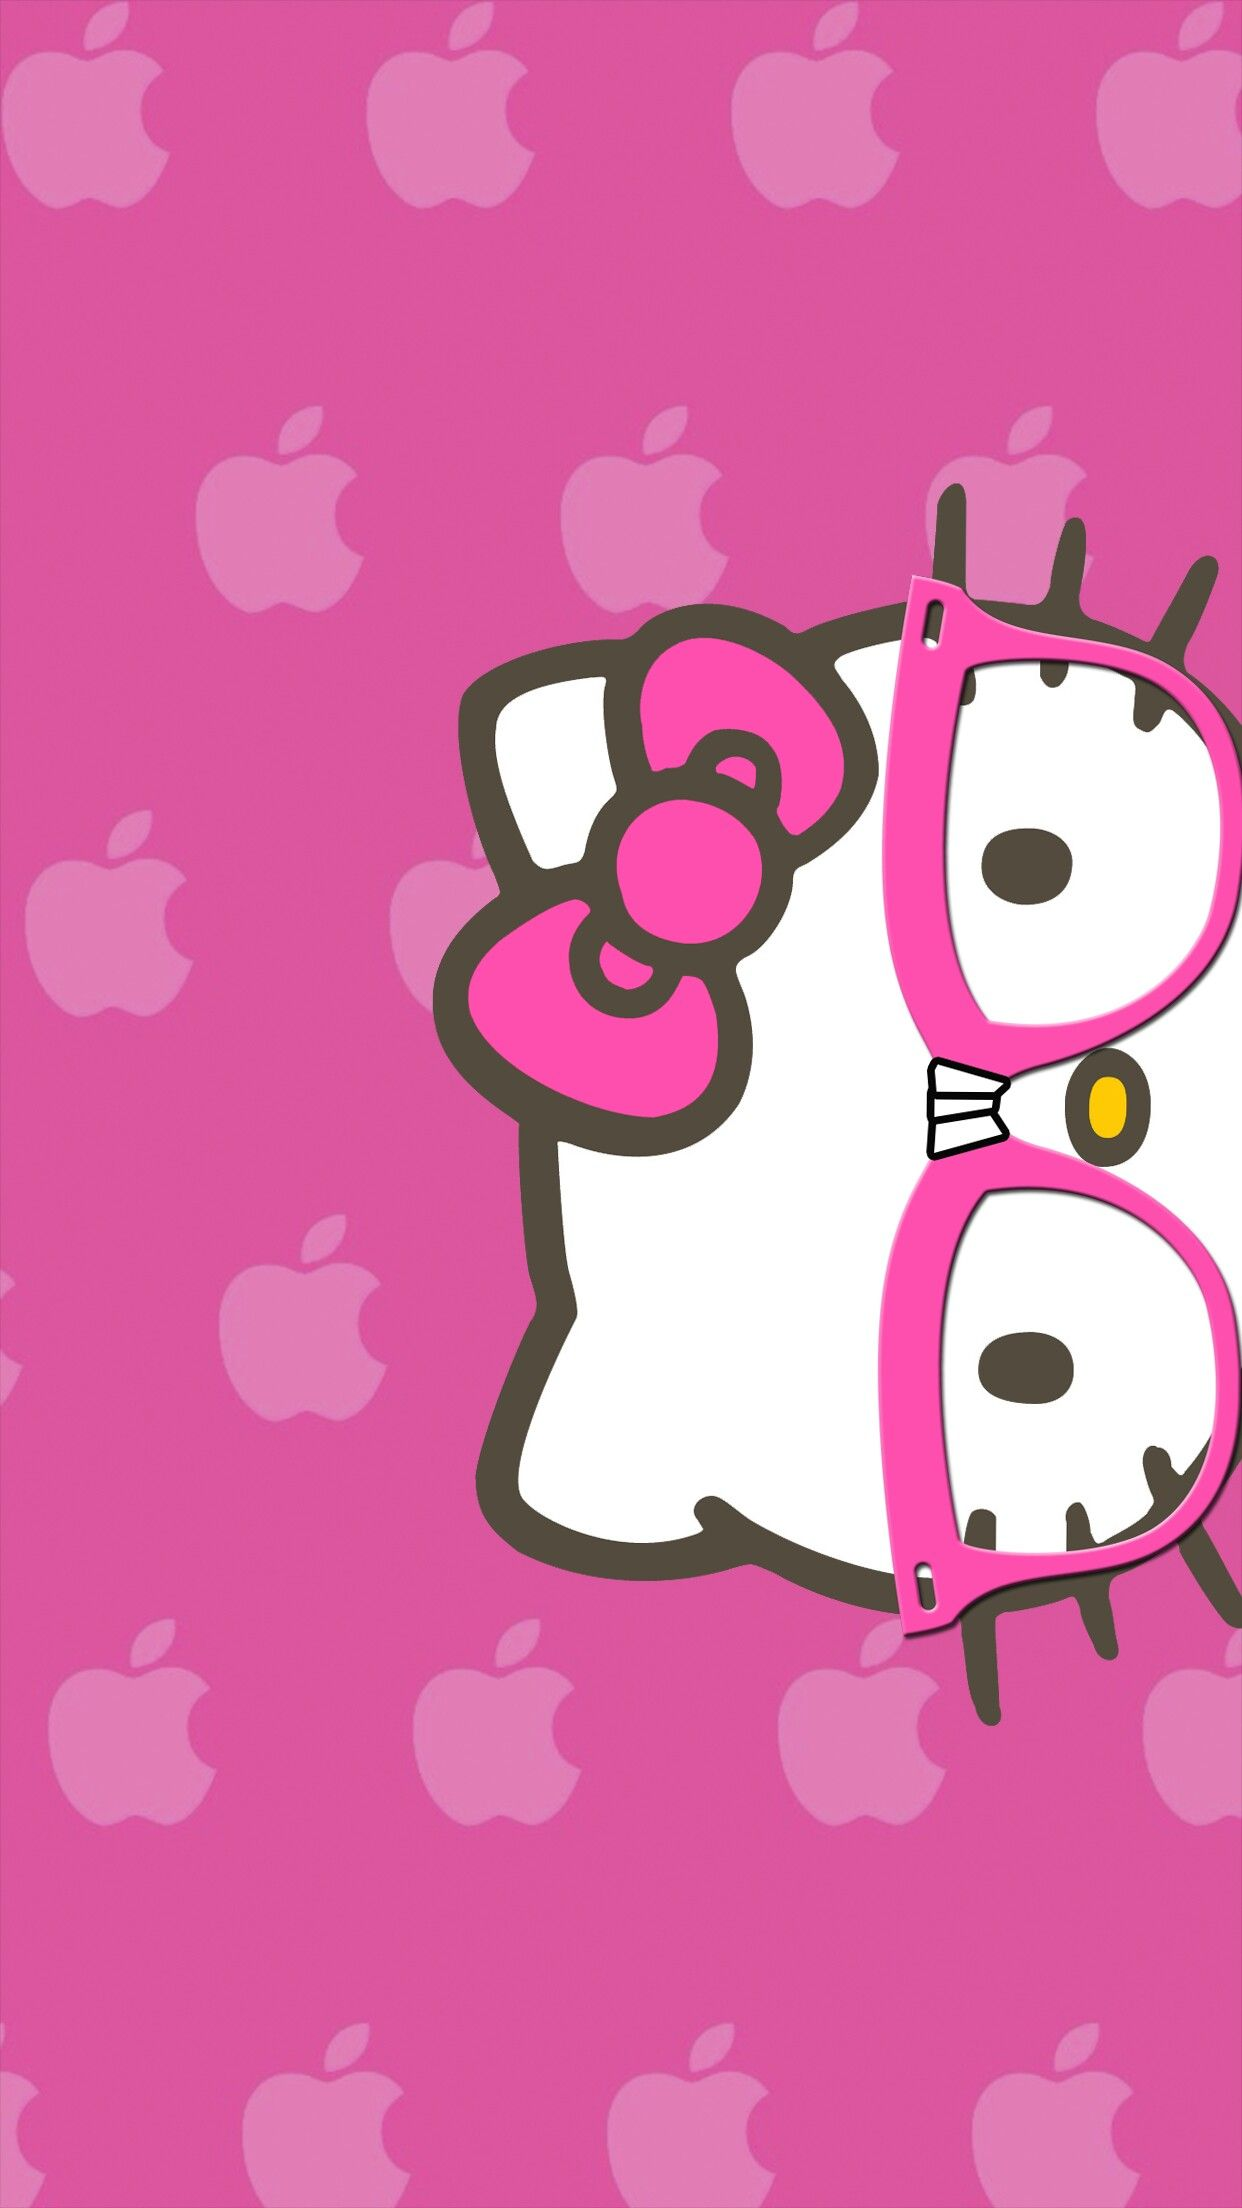 Good Wallpaper Hello Kitty Pattern - bde1cc8172f49c22e2c2bbbbc67bab3d  Best Photo Reference_605966.jpg